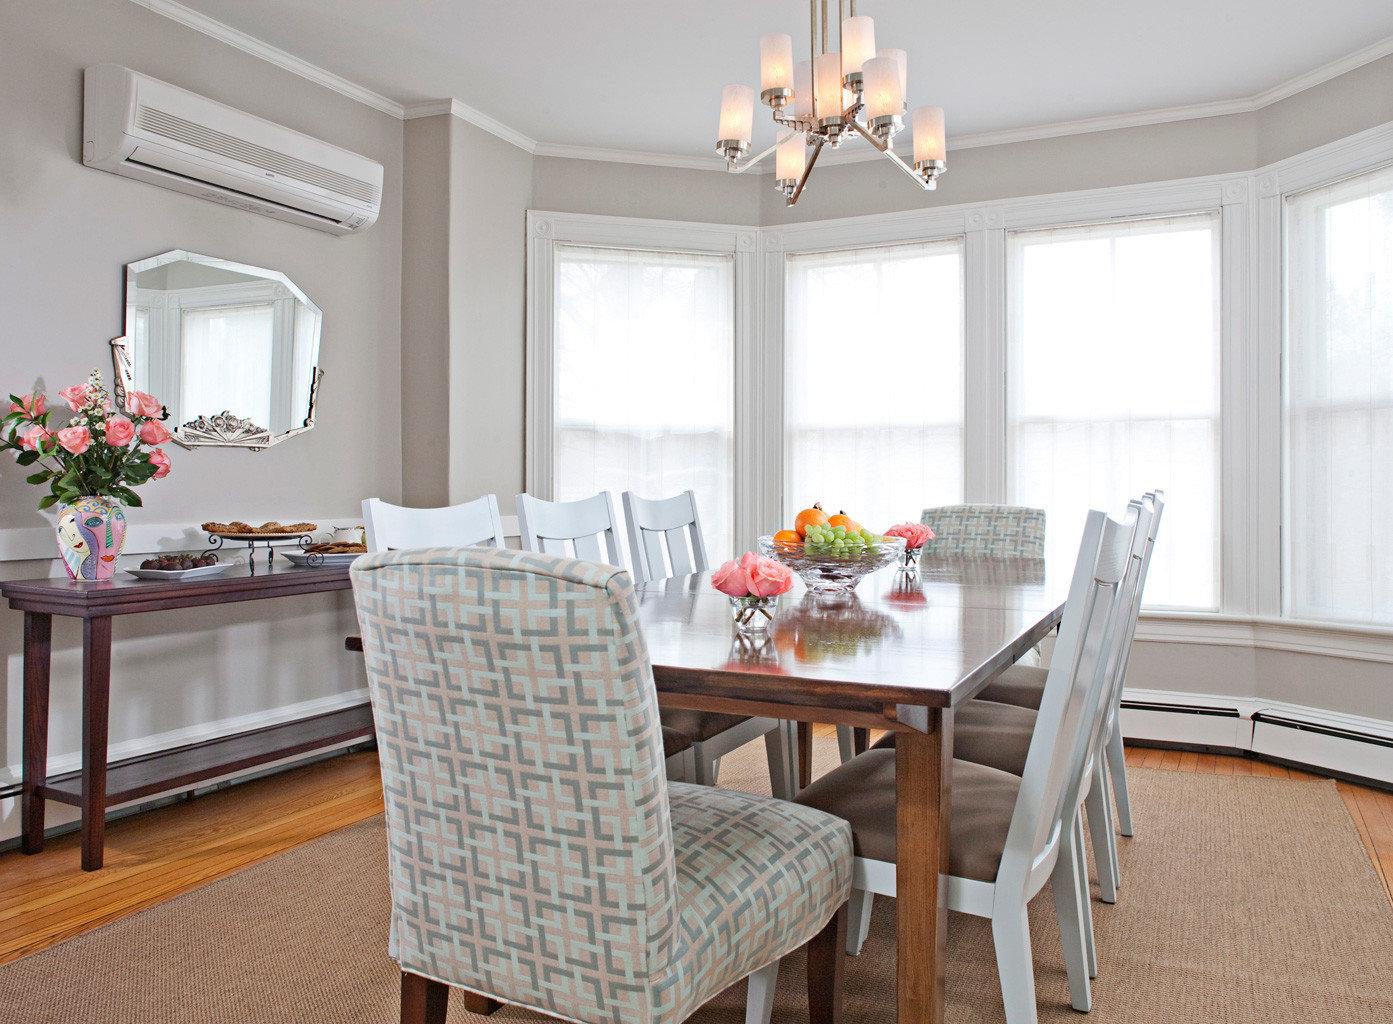 B&B Dining Elegant Historic Inn property home living room hardwood cottage farmhouse